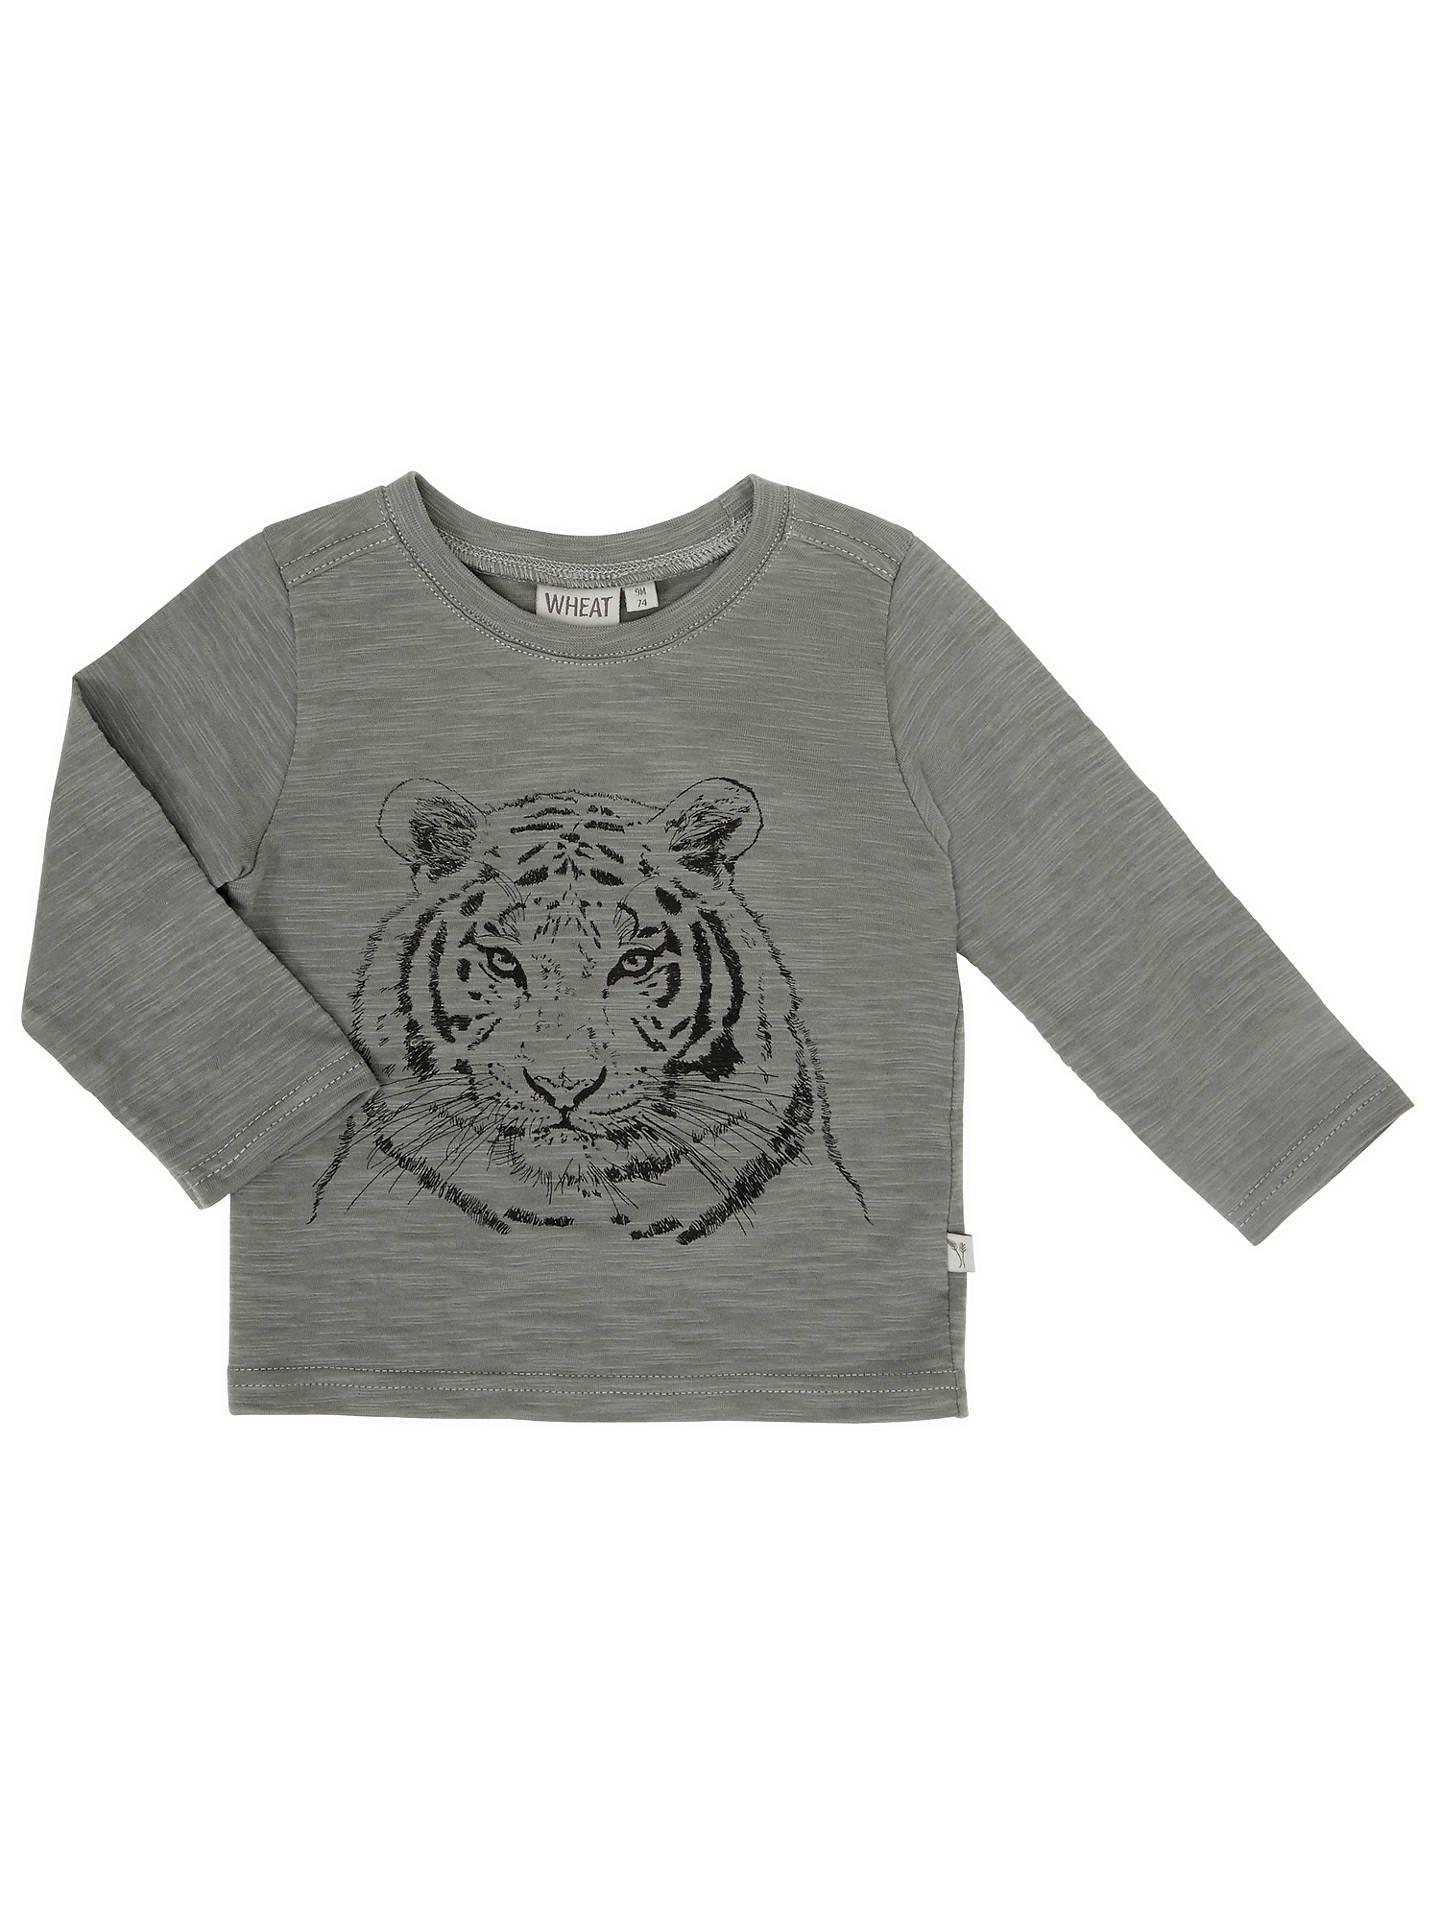 6510346c5 Buy Wheat Baby Tiger Print T-Shirt, Grey, 18 months Online at johnlewis ...